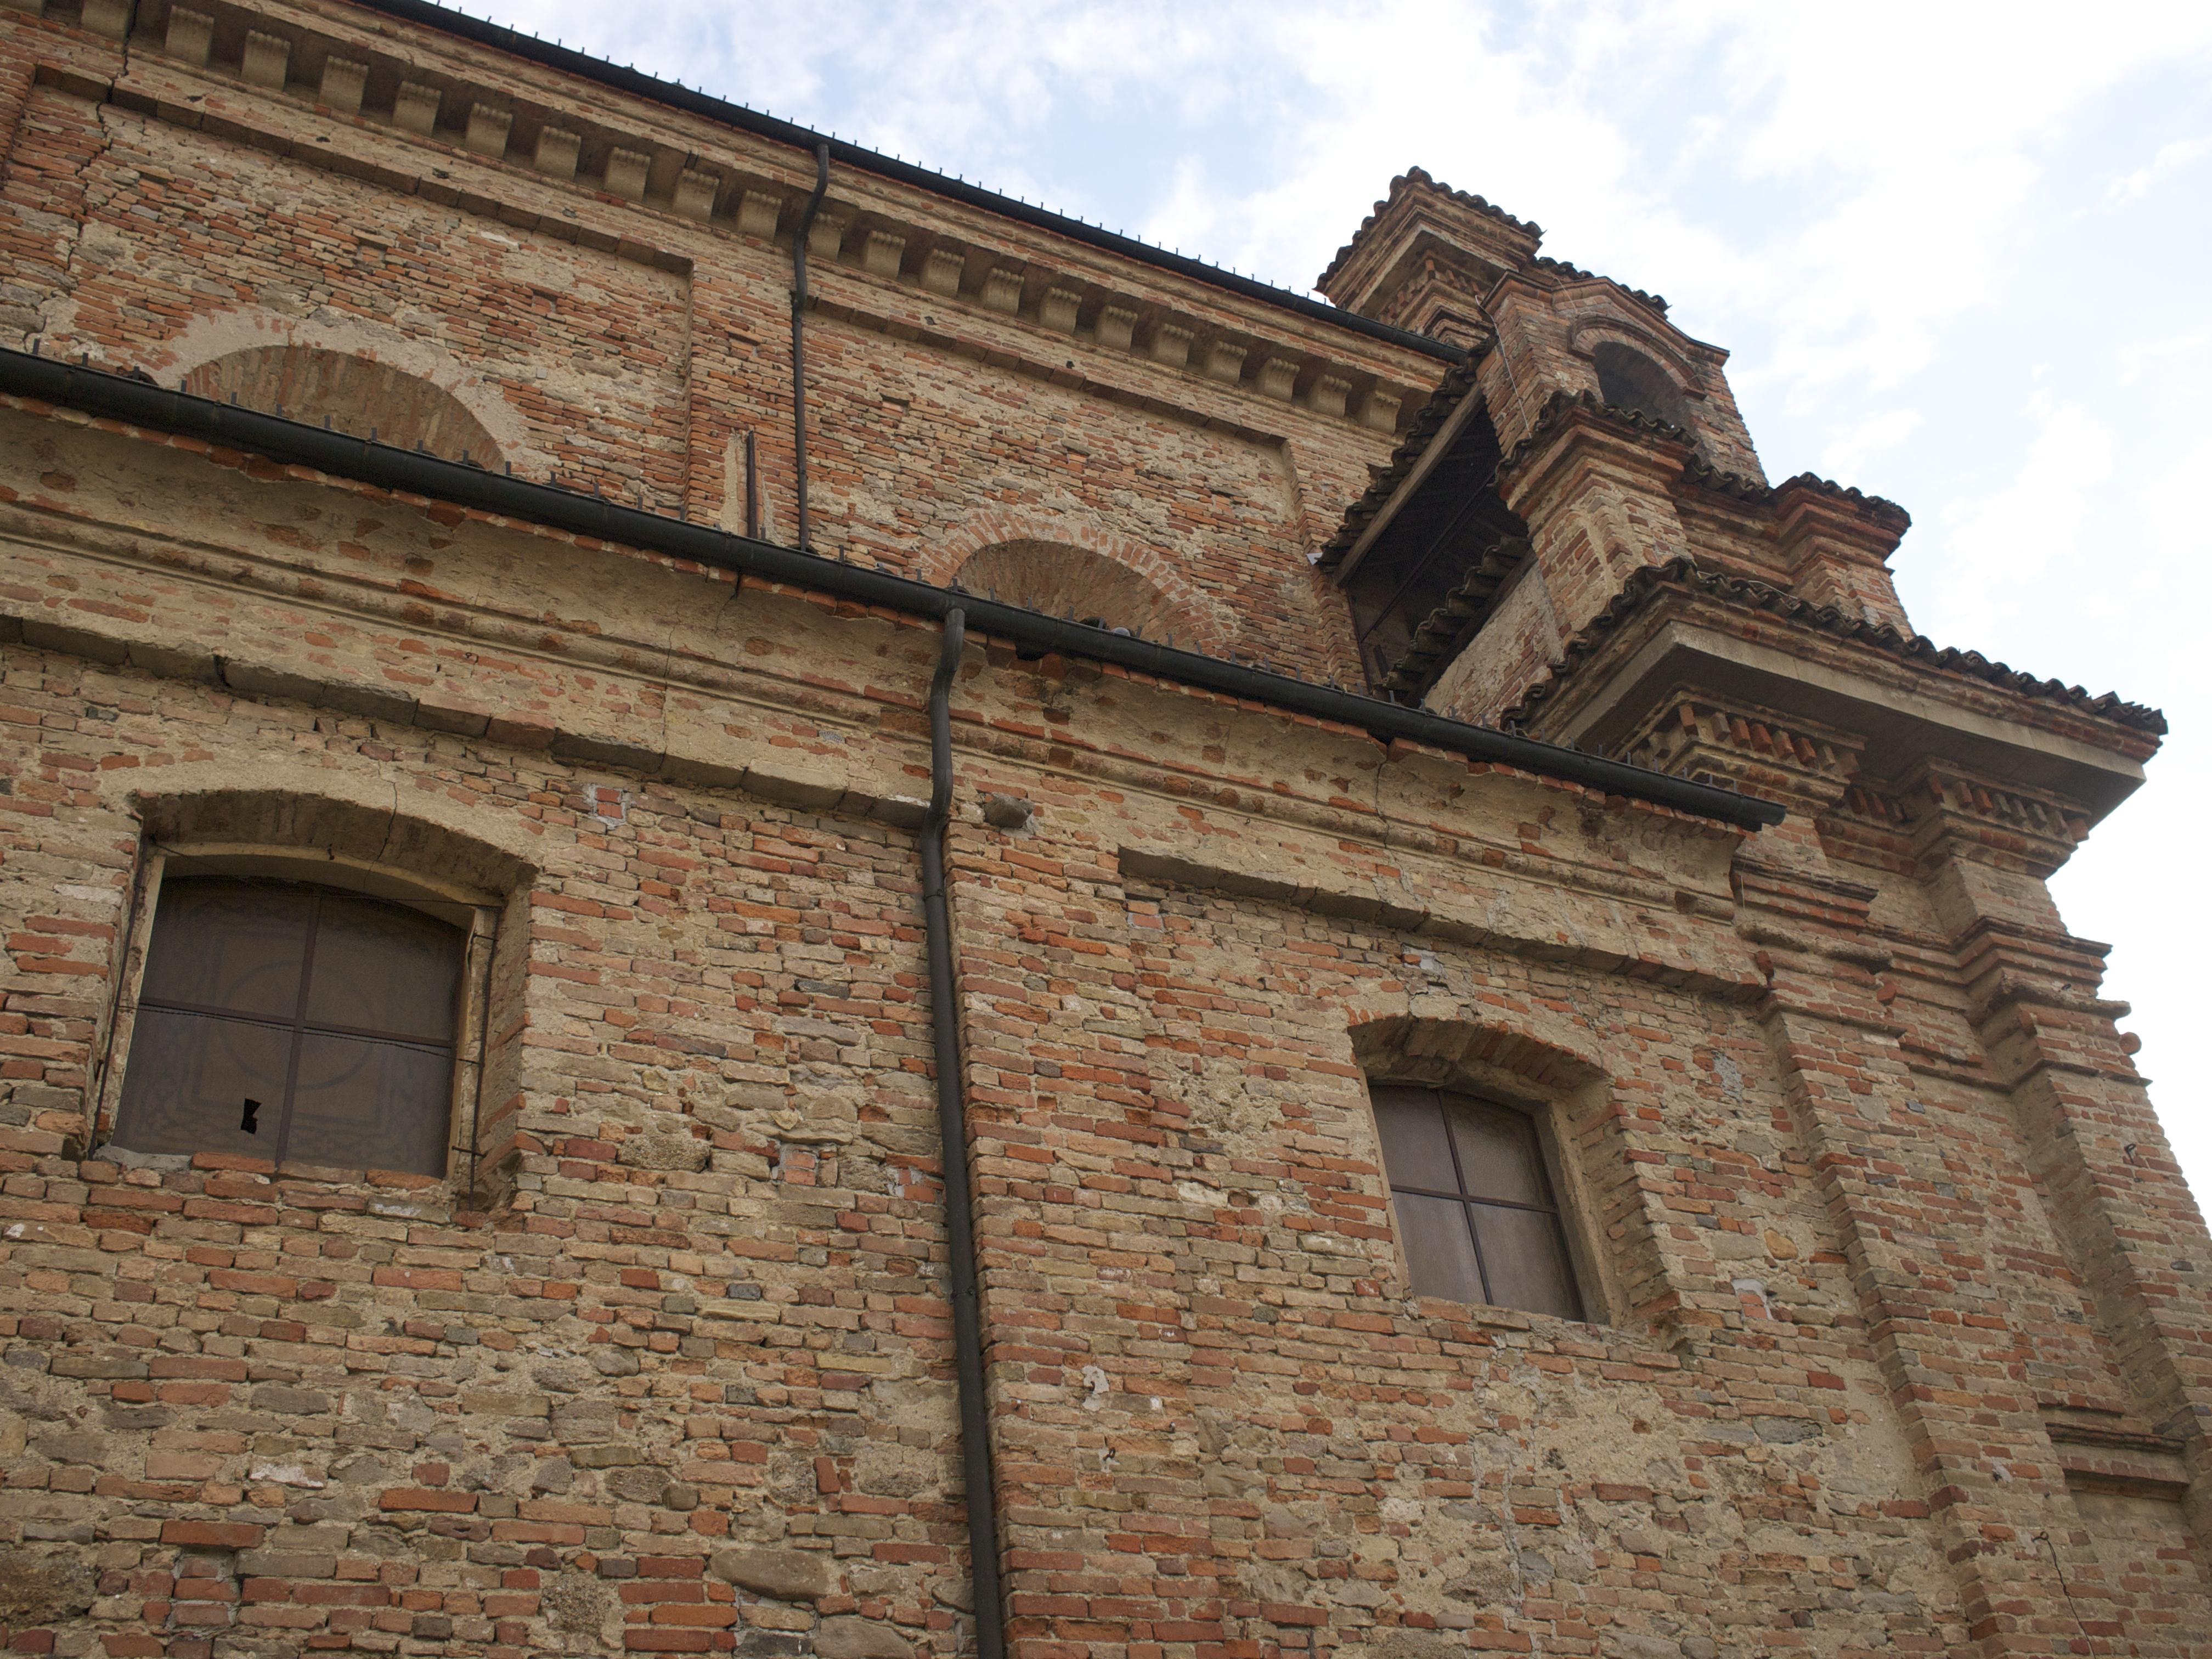 Saint Martin Parochial Church, La Morra, Italy, 2014 (2)